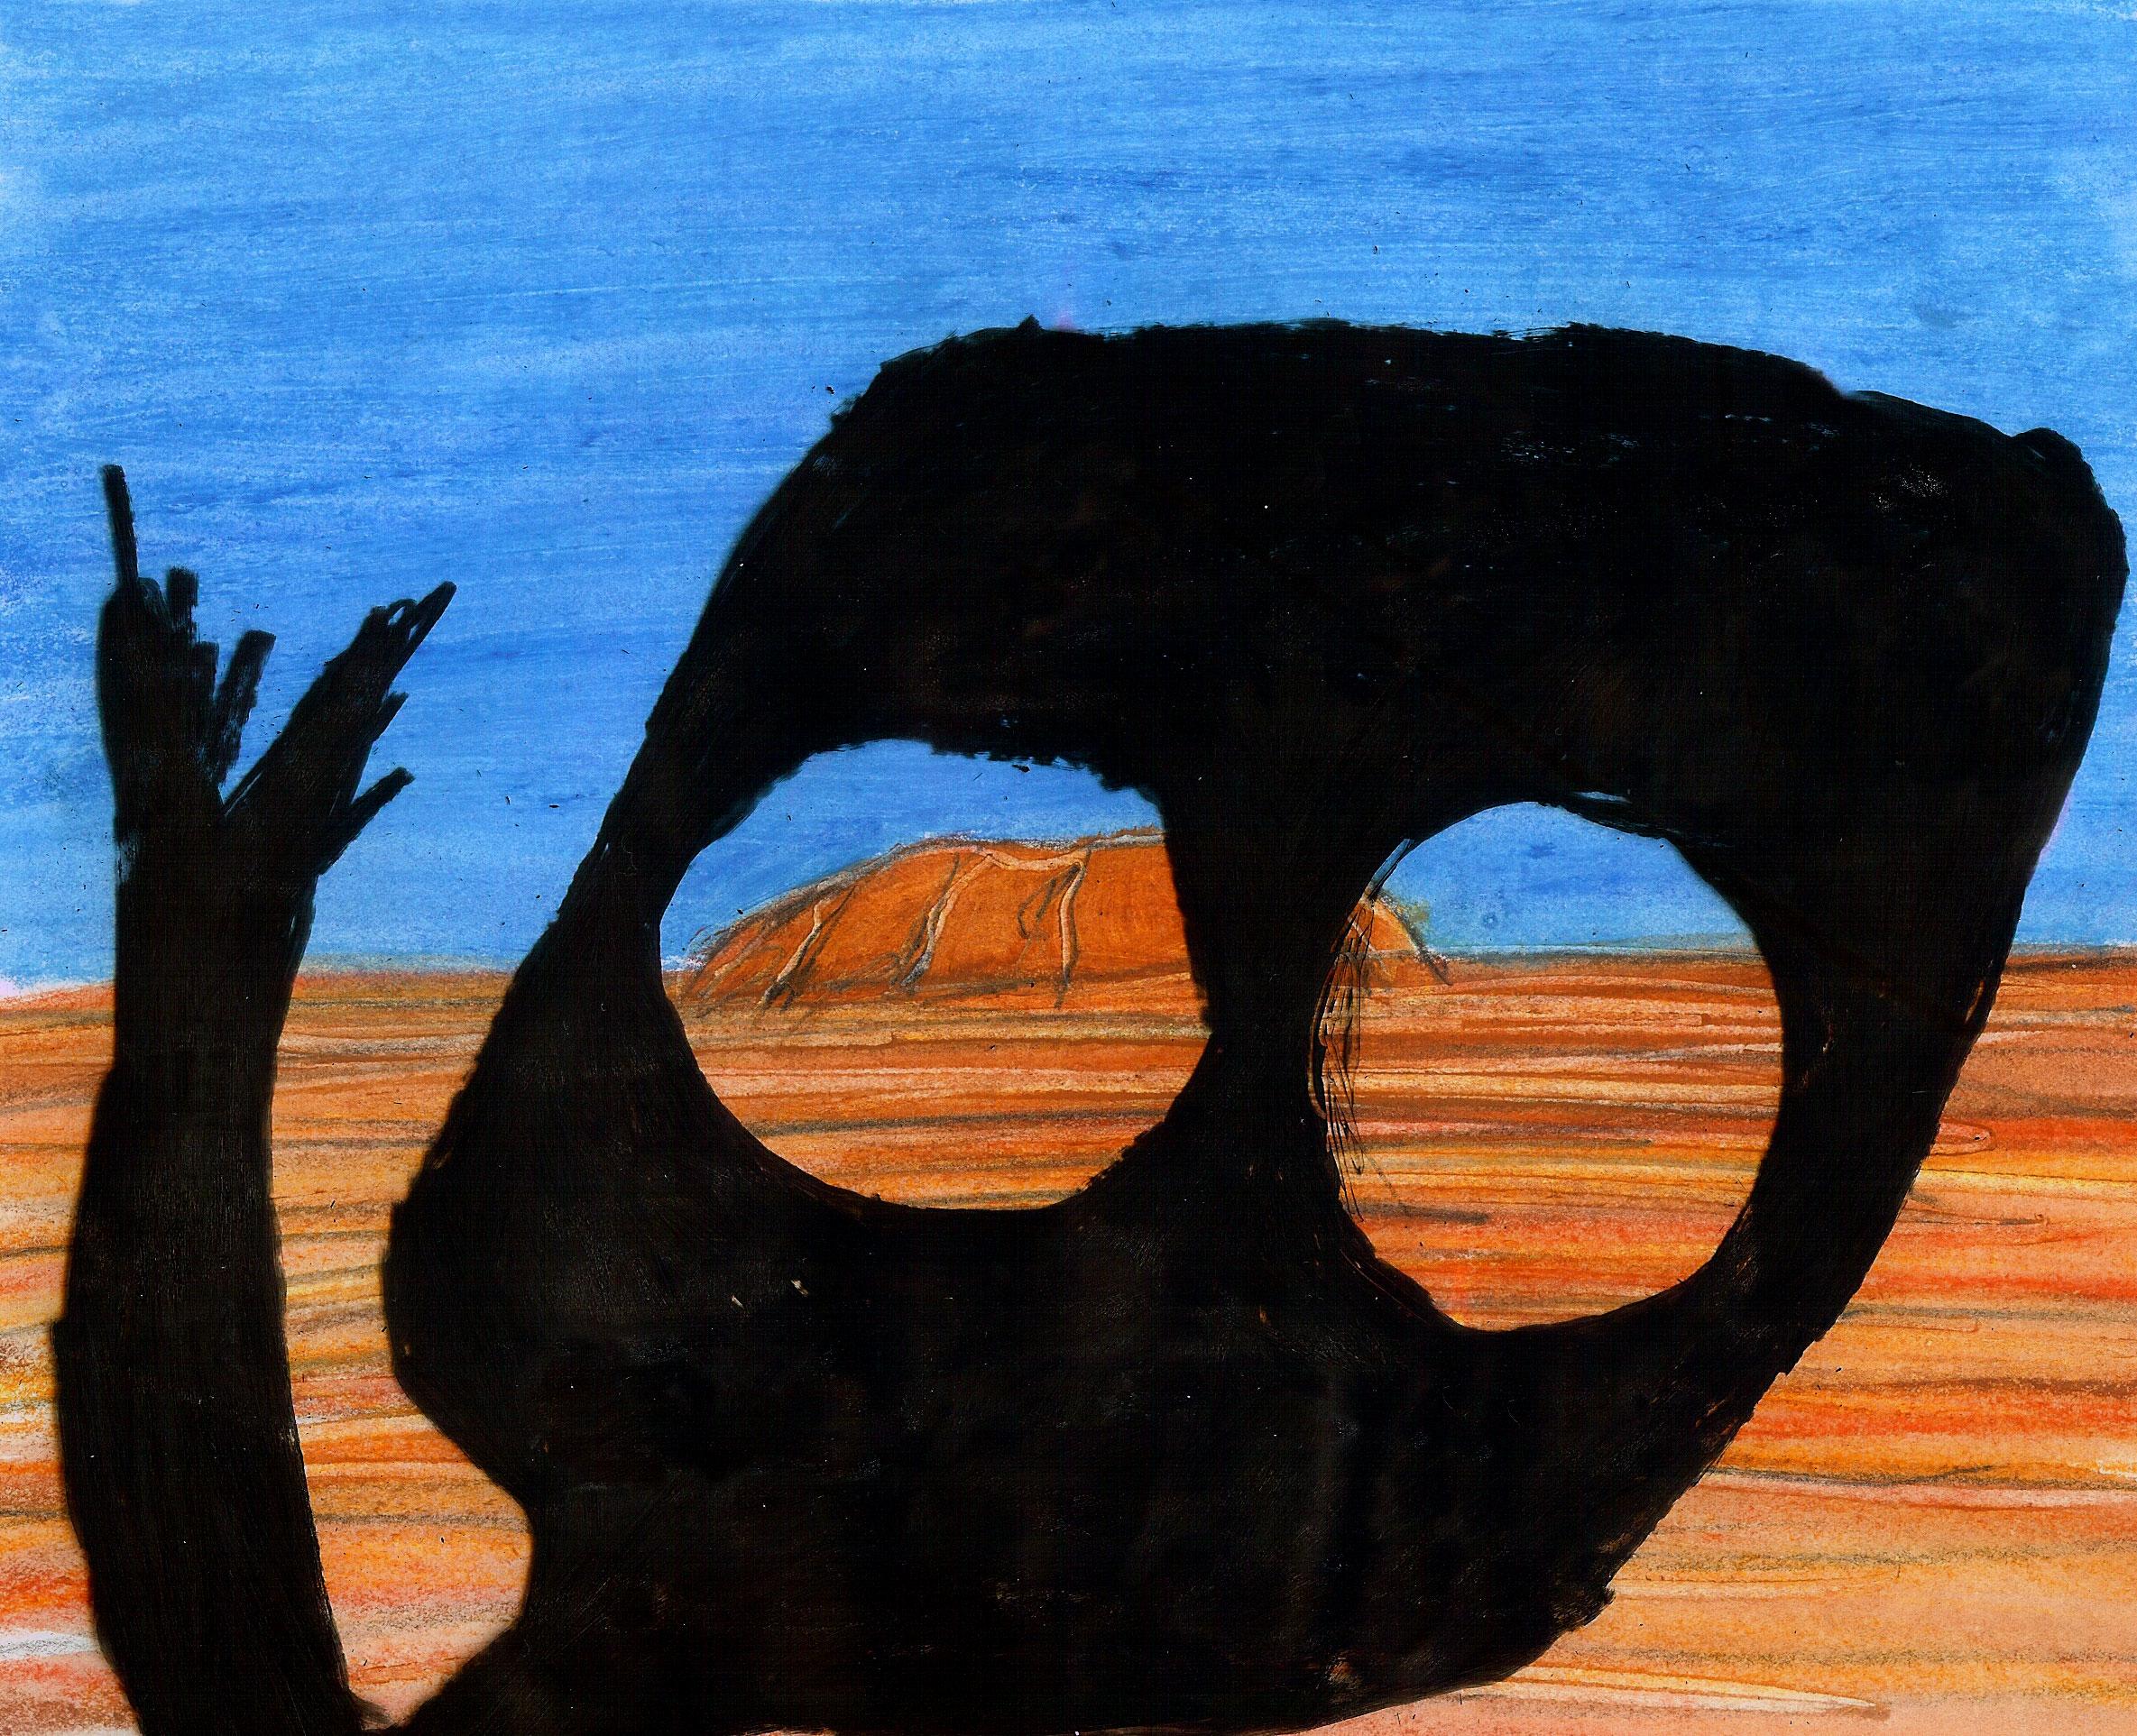 Kathy Smith | Ayers Rock | 1985 | Super8 | 0:50